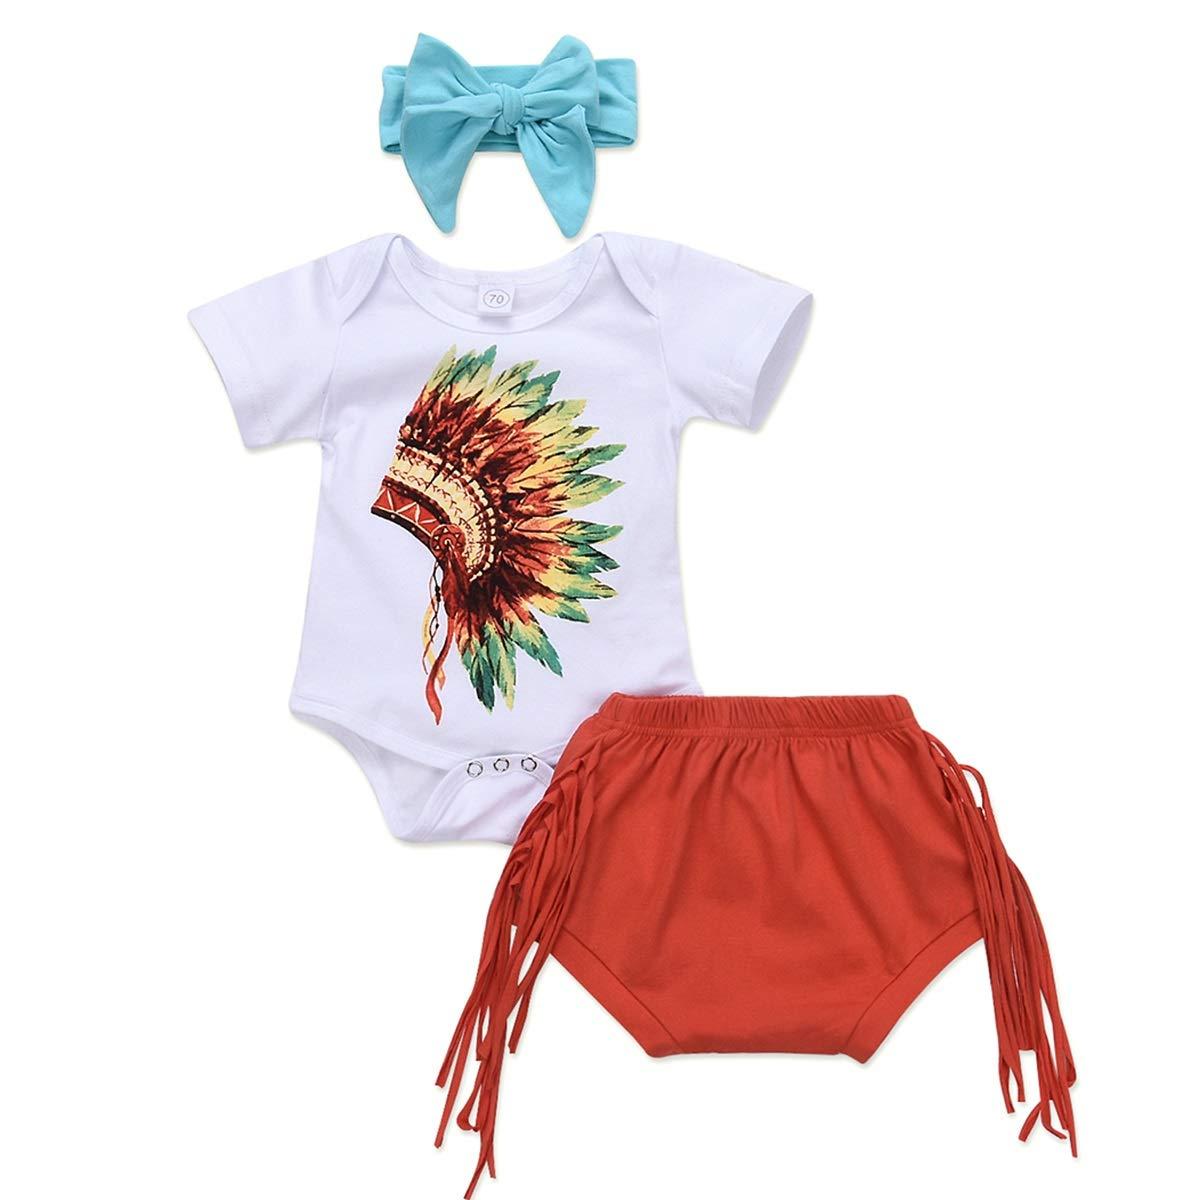 Newborn Baby Infant Girls Romper+Tassel Shorts+Bowknot Headband Summer Outfits 3pcs//Set